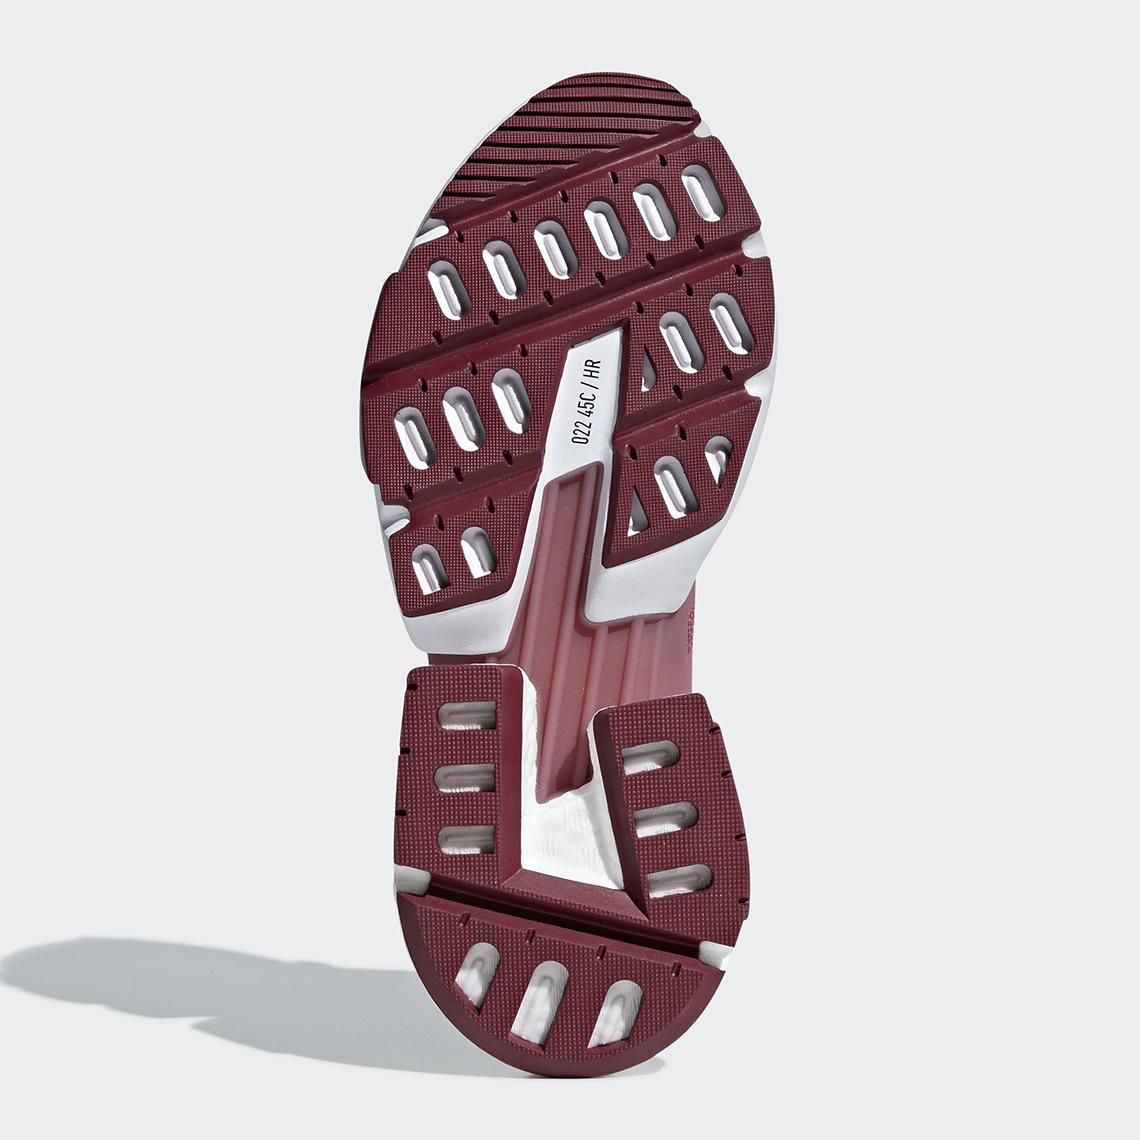 adidas pod b37508 4 - adidas POD B37508 Release Info + Photos